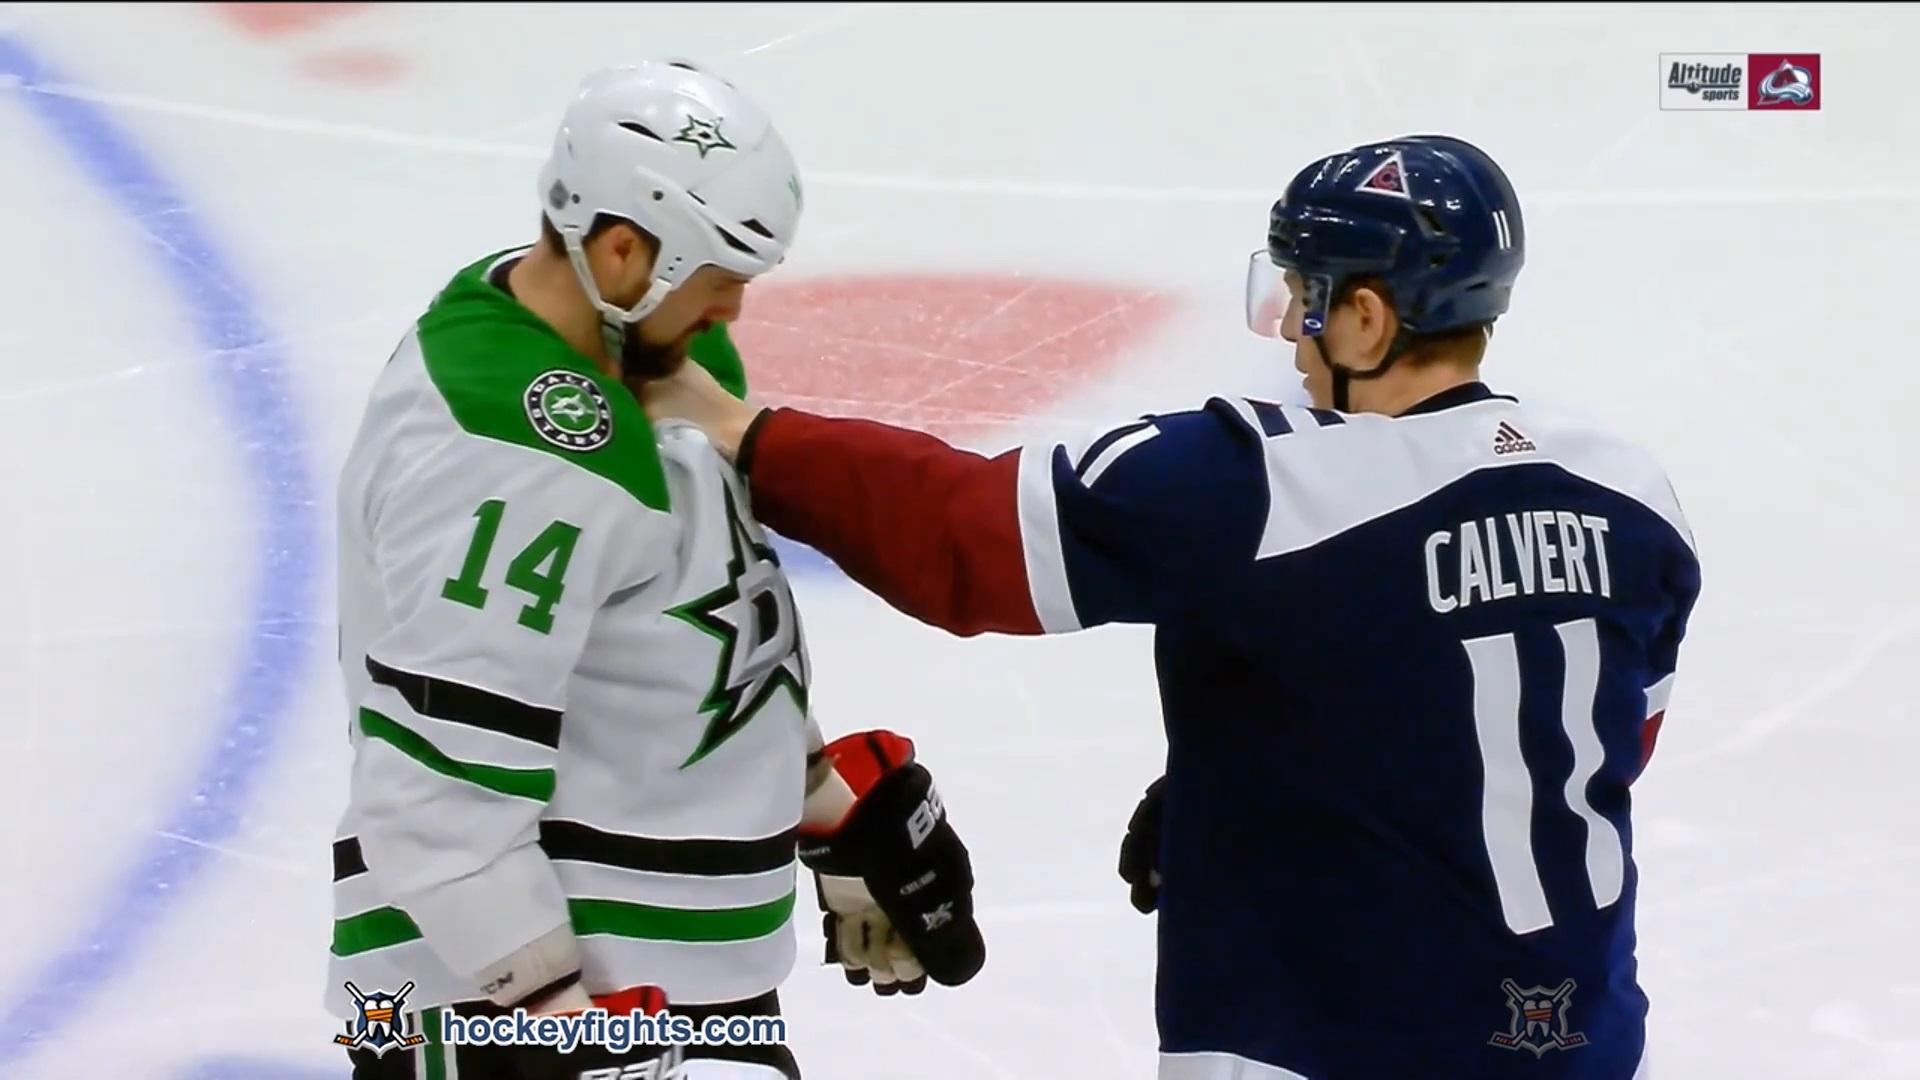 Jamie Benn vs Matt Calvert